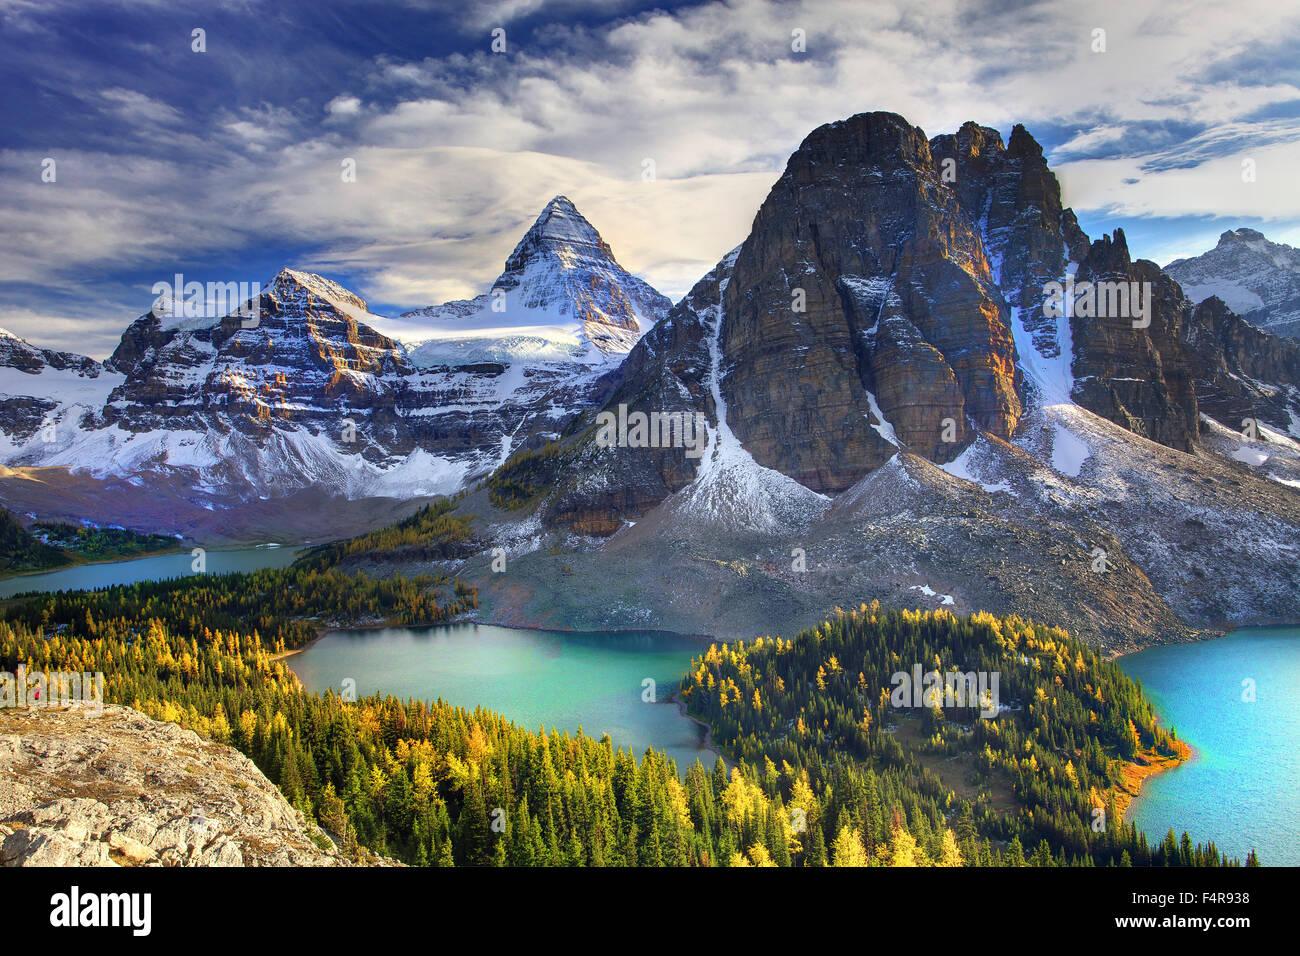 Kanada, Provinz, Natur, Landschaft, Rockies, kanadischen Rocky Mountains, Gebirge, See, Landschaft, Britisch-Kolumbien, Stockbild